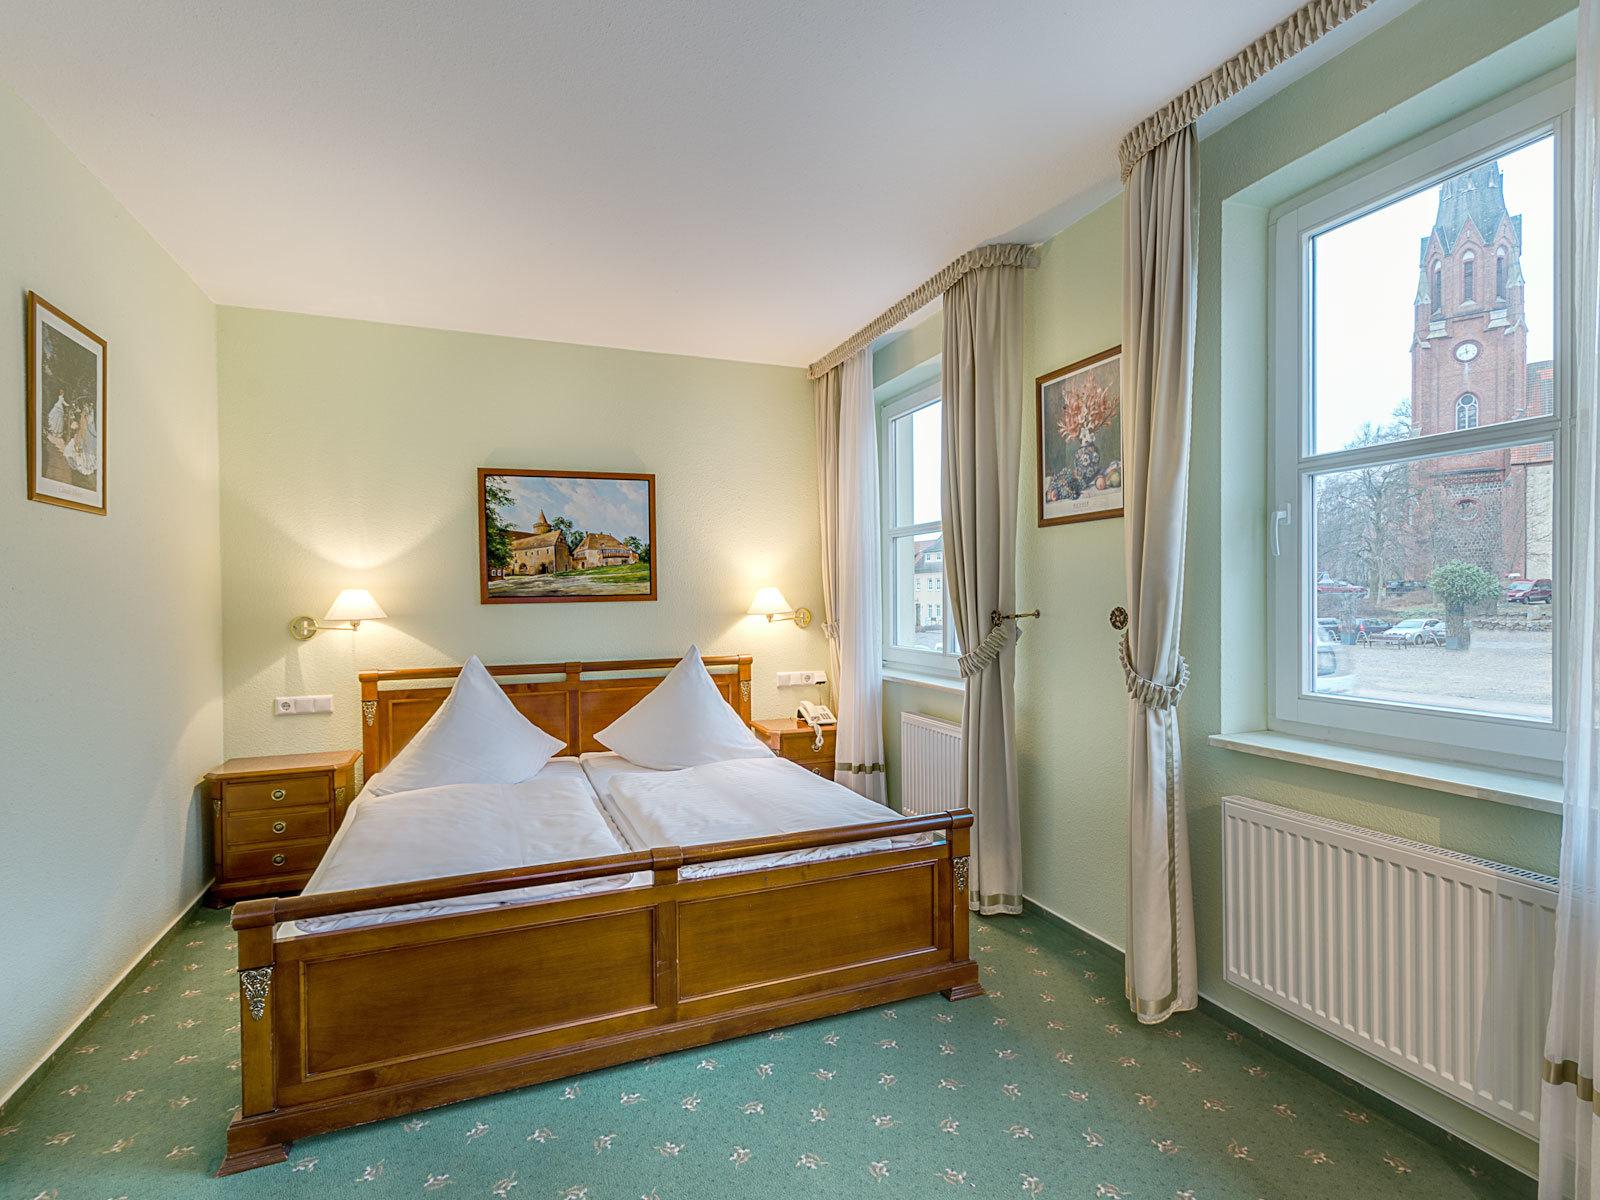 One-Night-Stay-Sorglos in Burg Stargard